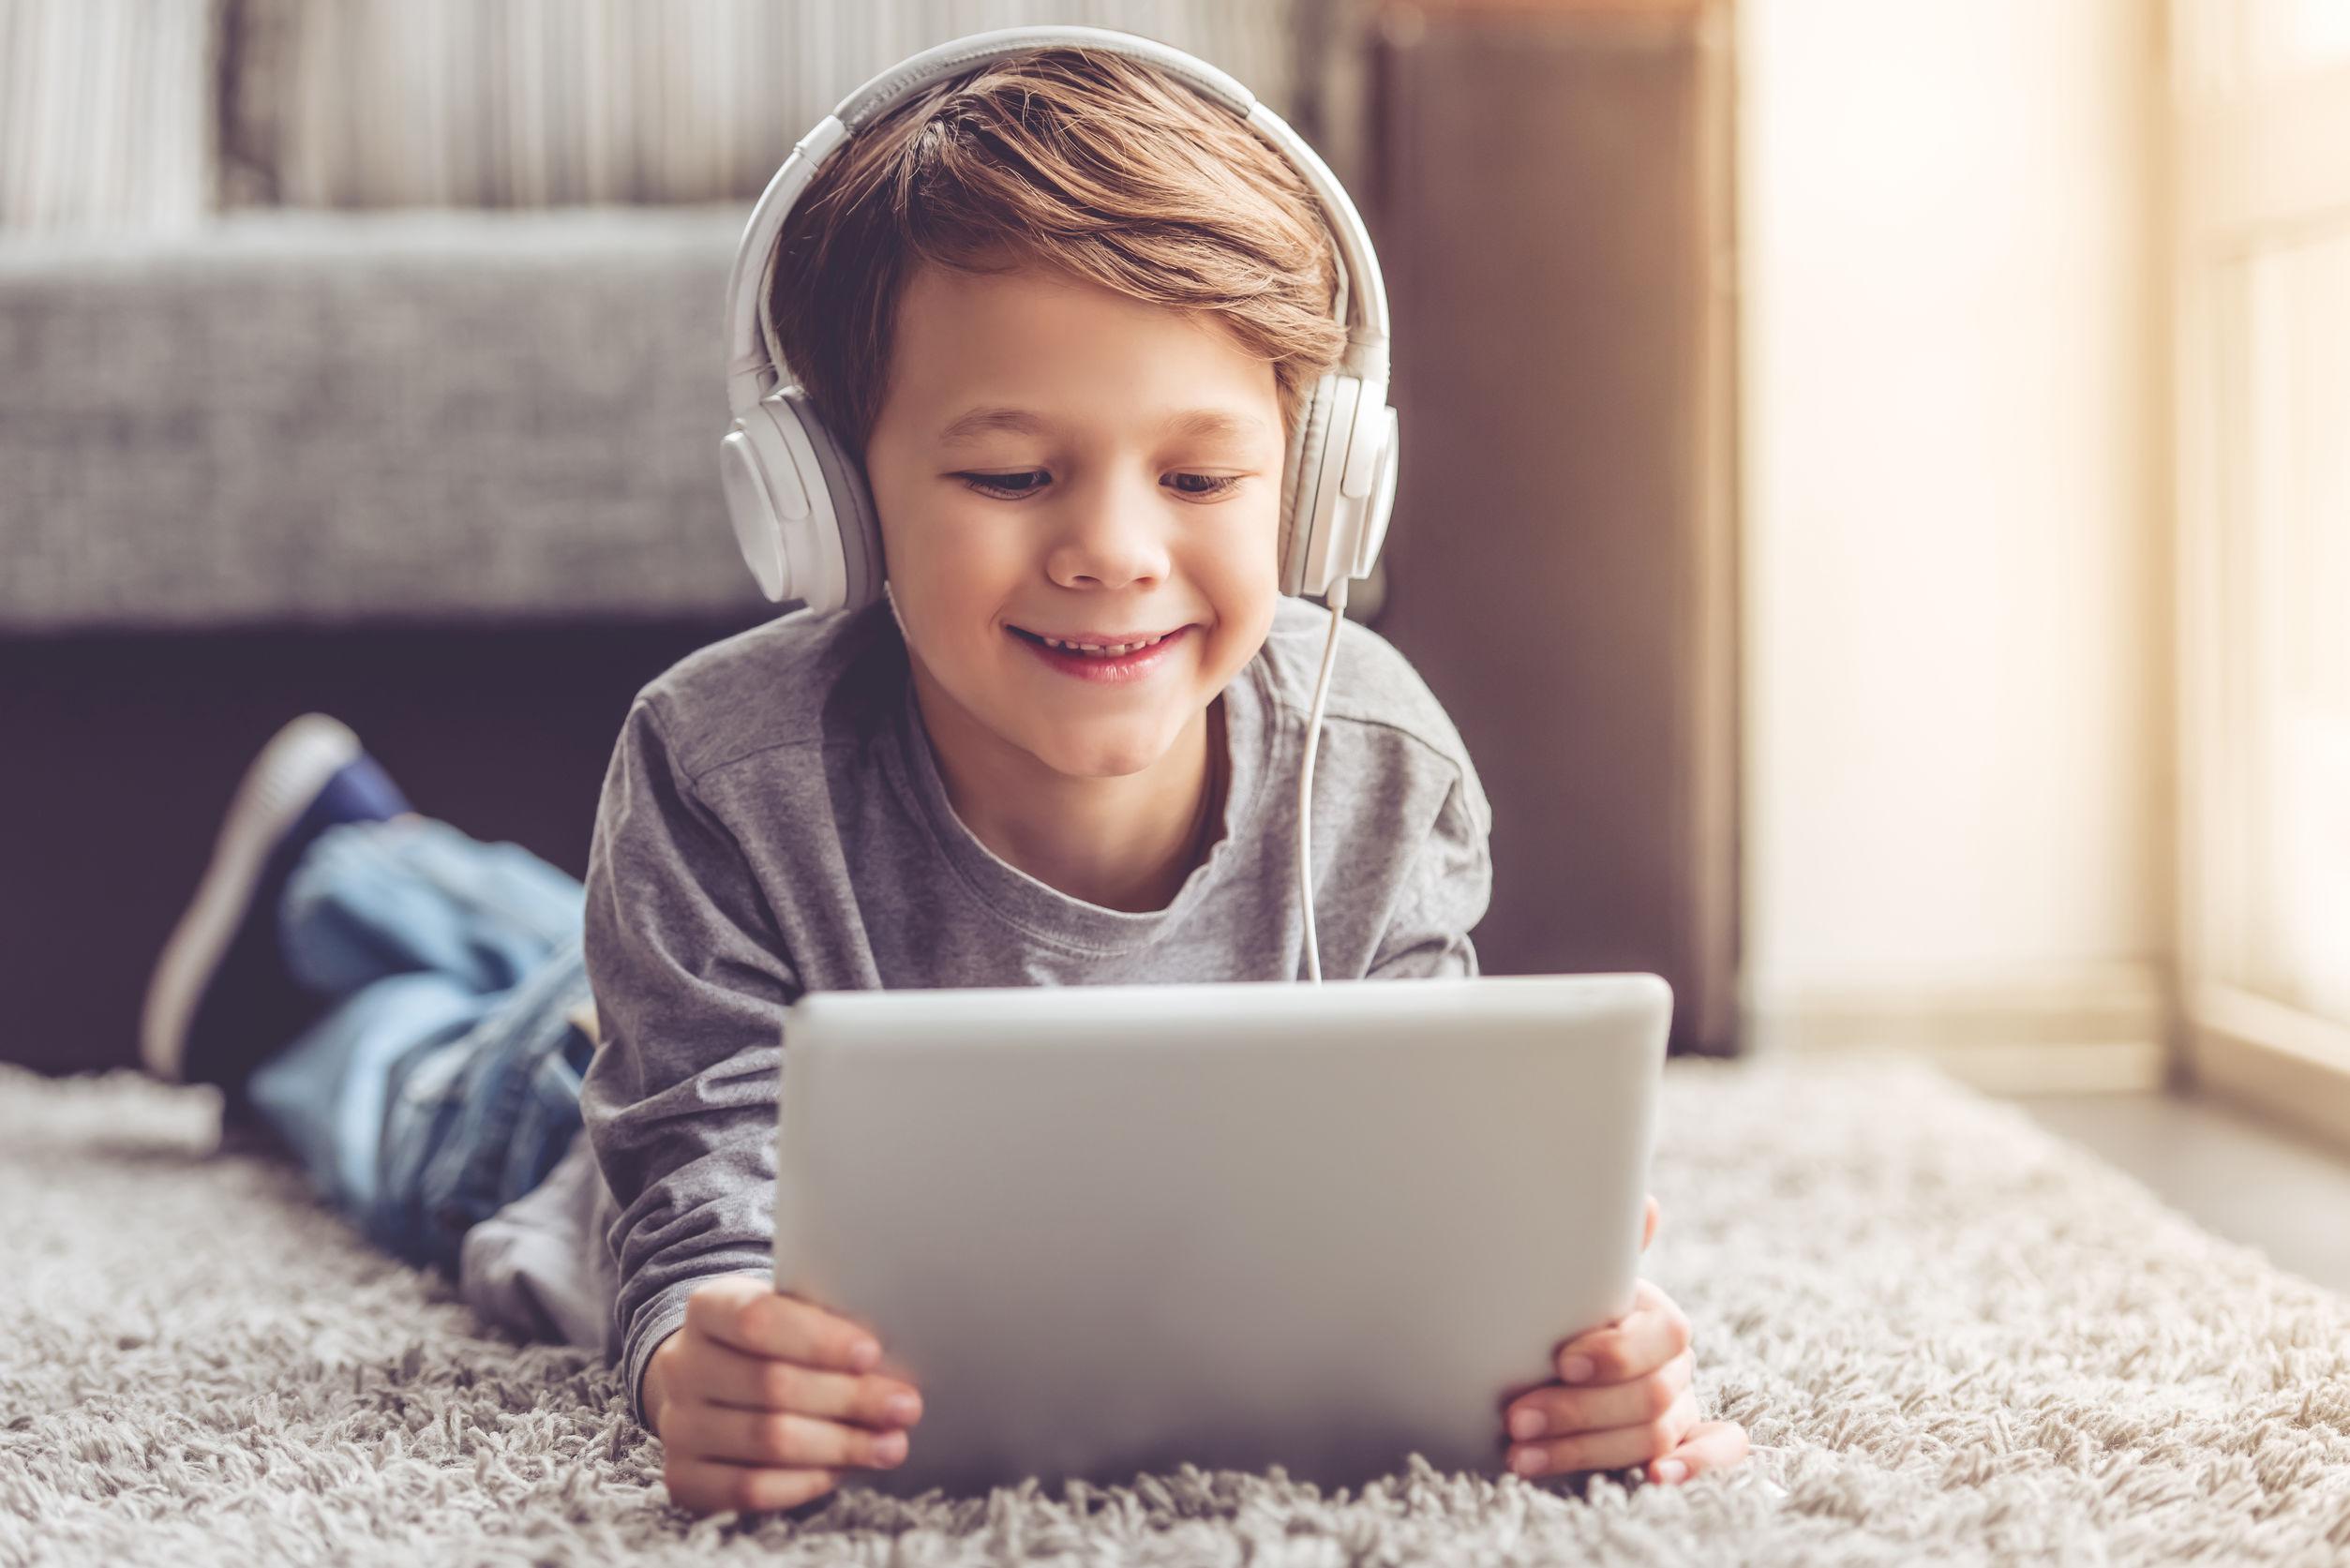 Kinder Tablet: Test & Empfehlungen (04/21)